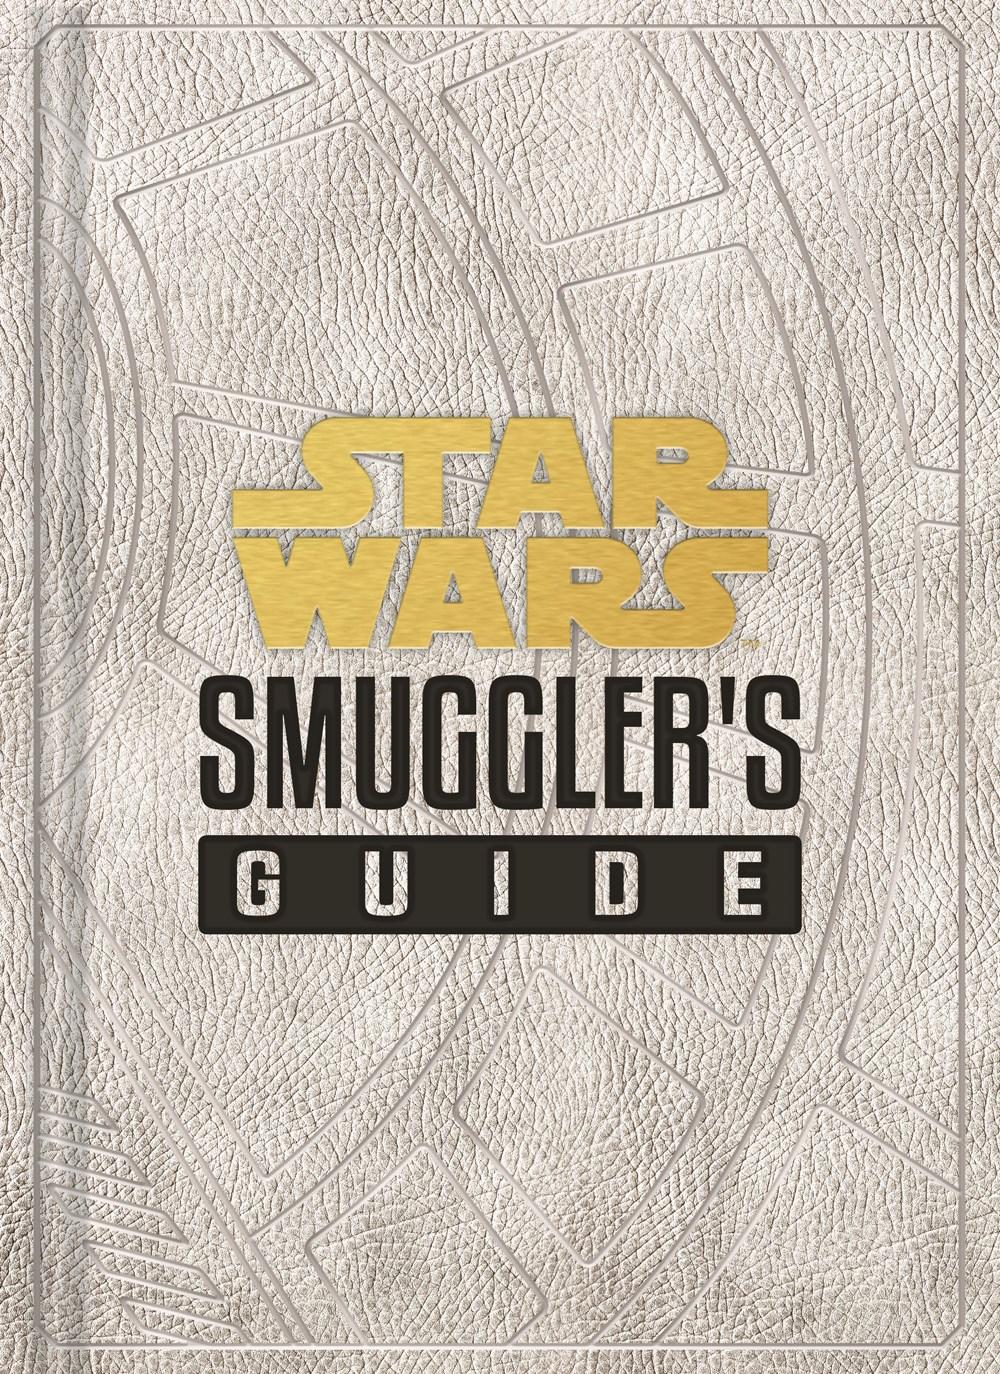 Smuggler's Guide (17.09.2019)